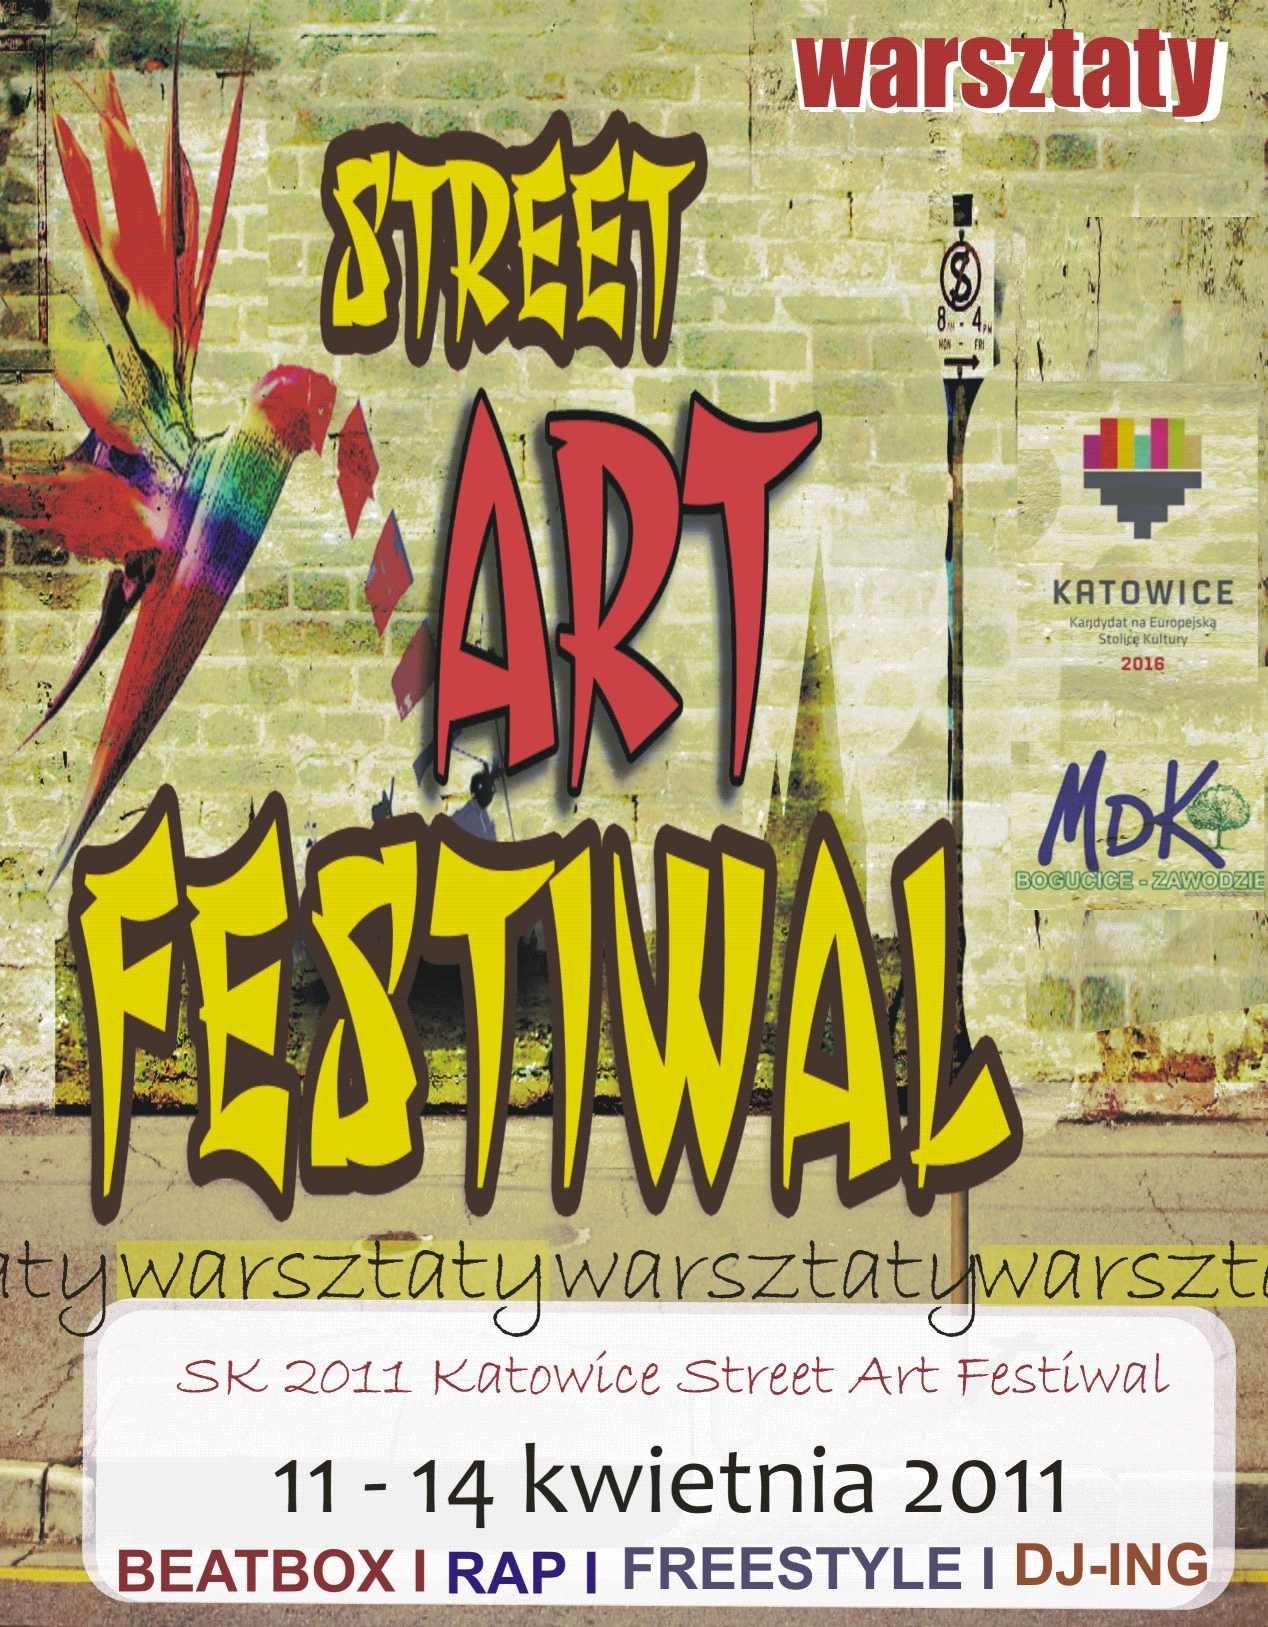 Street Art Festival Katowice